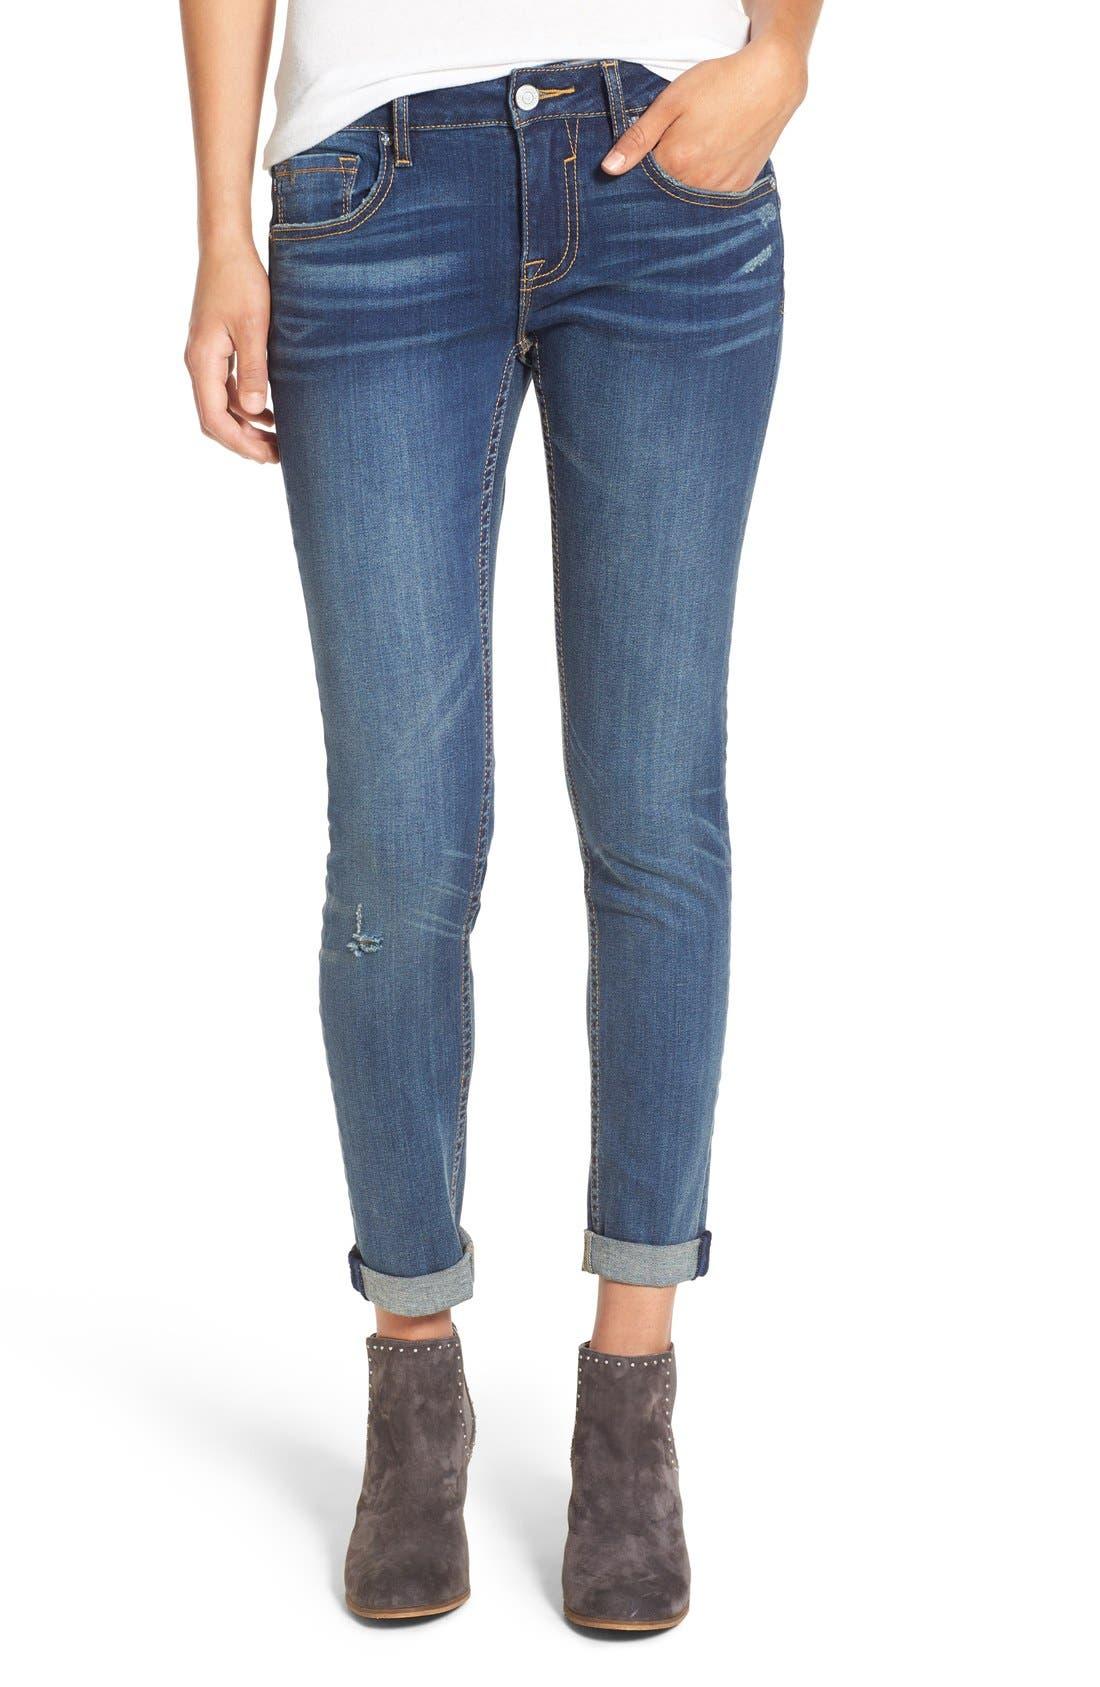 Main Image - Vigoss 'Thompson' Distressed Skinny Jeans (Neptune)